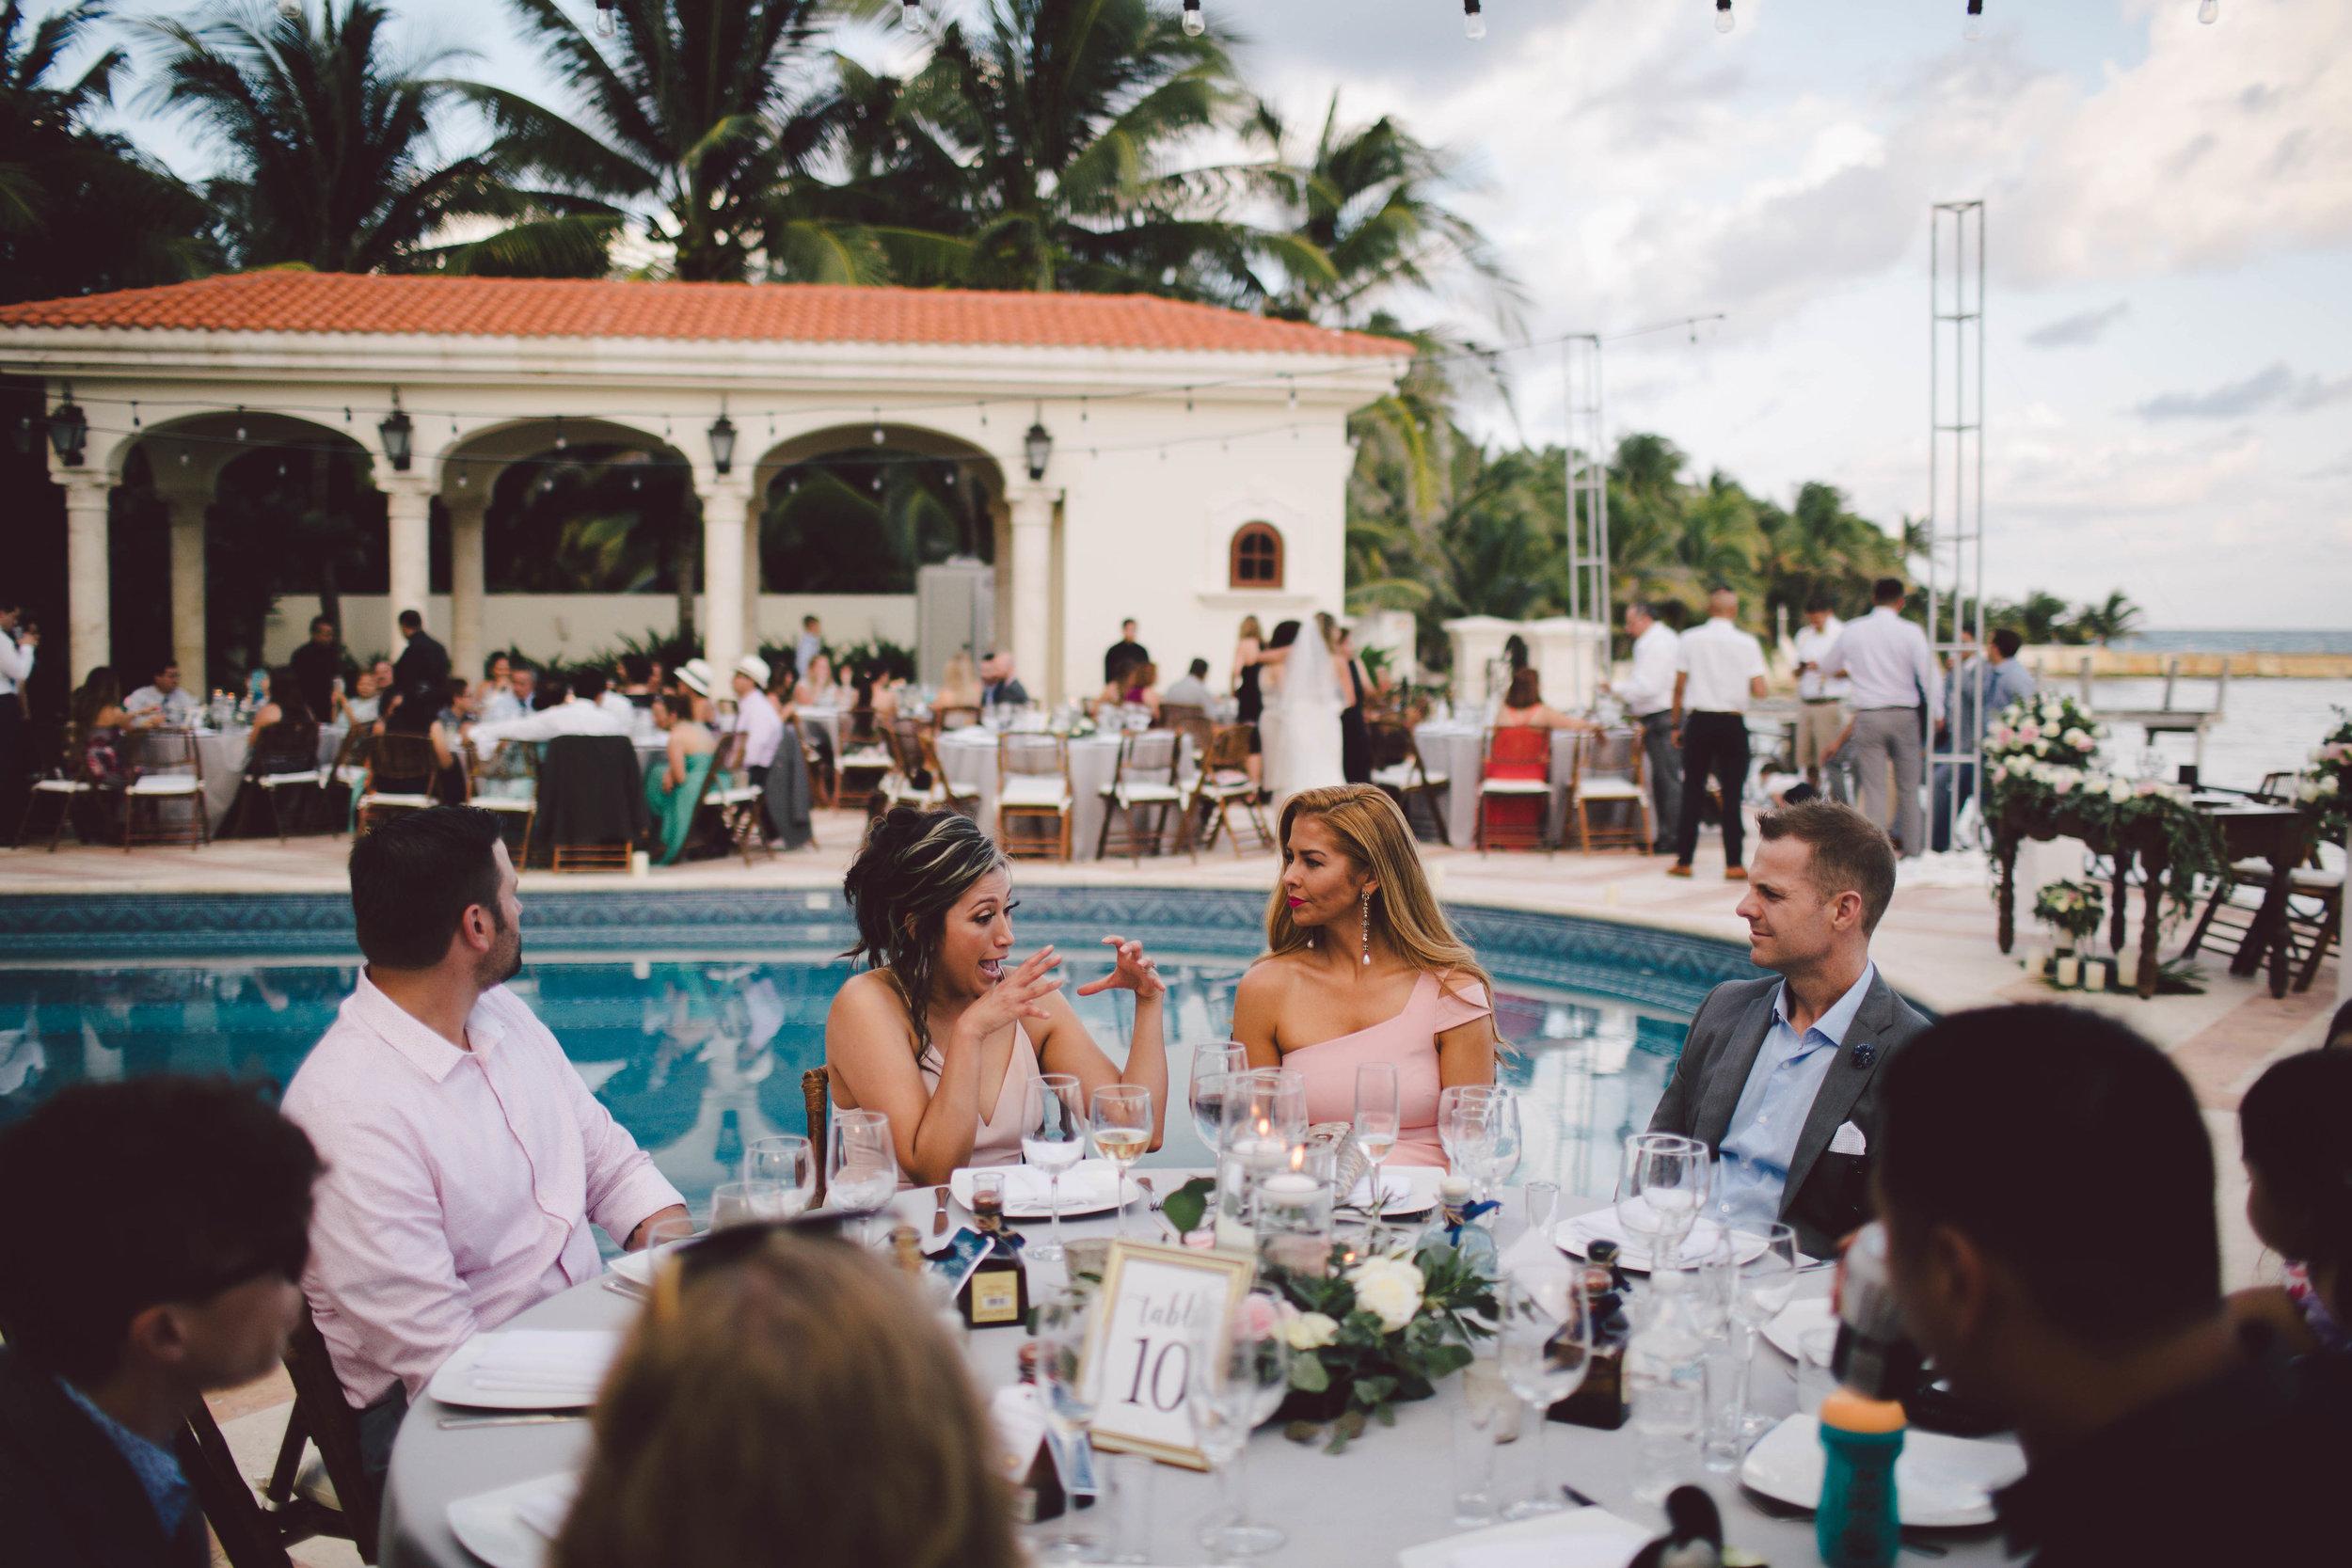 mexico_wedding_cancun_villa_la_joya_evangeline_lane_110.jpg